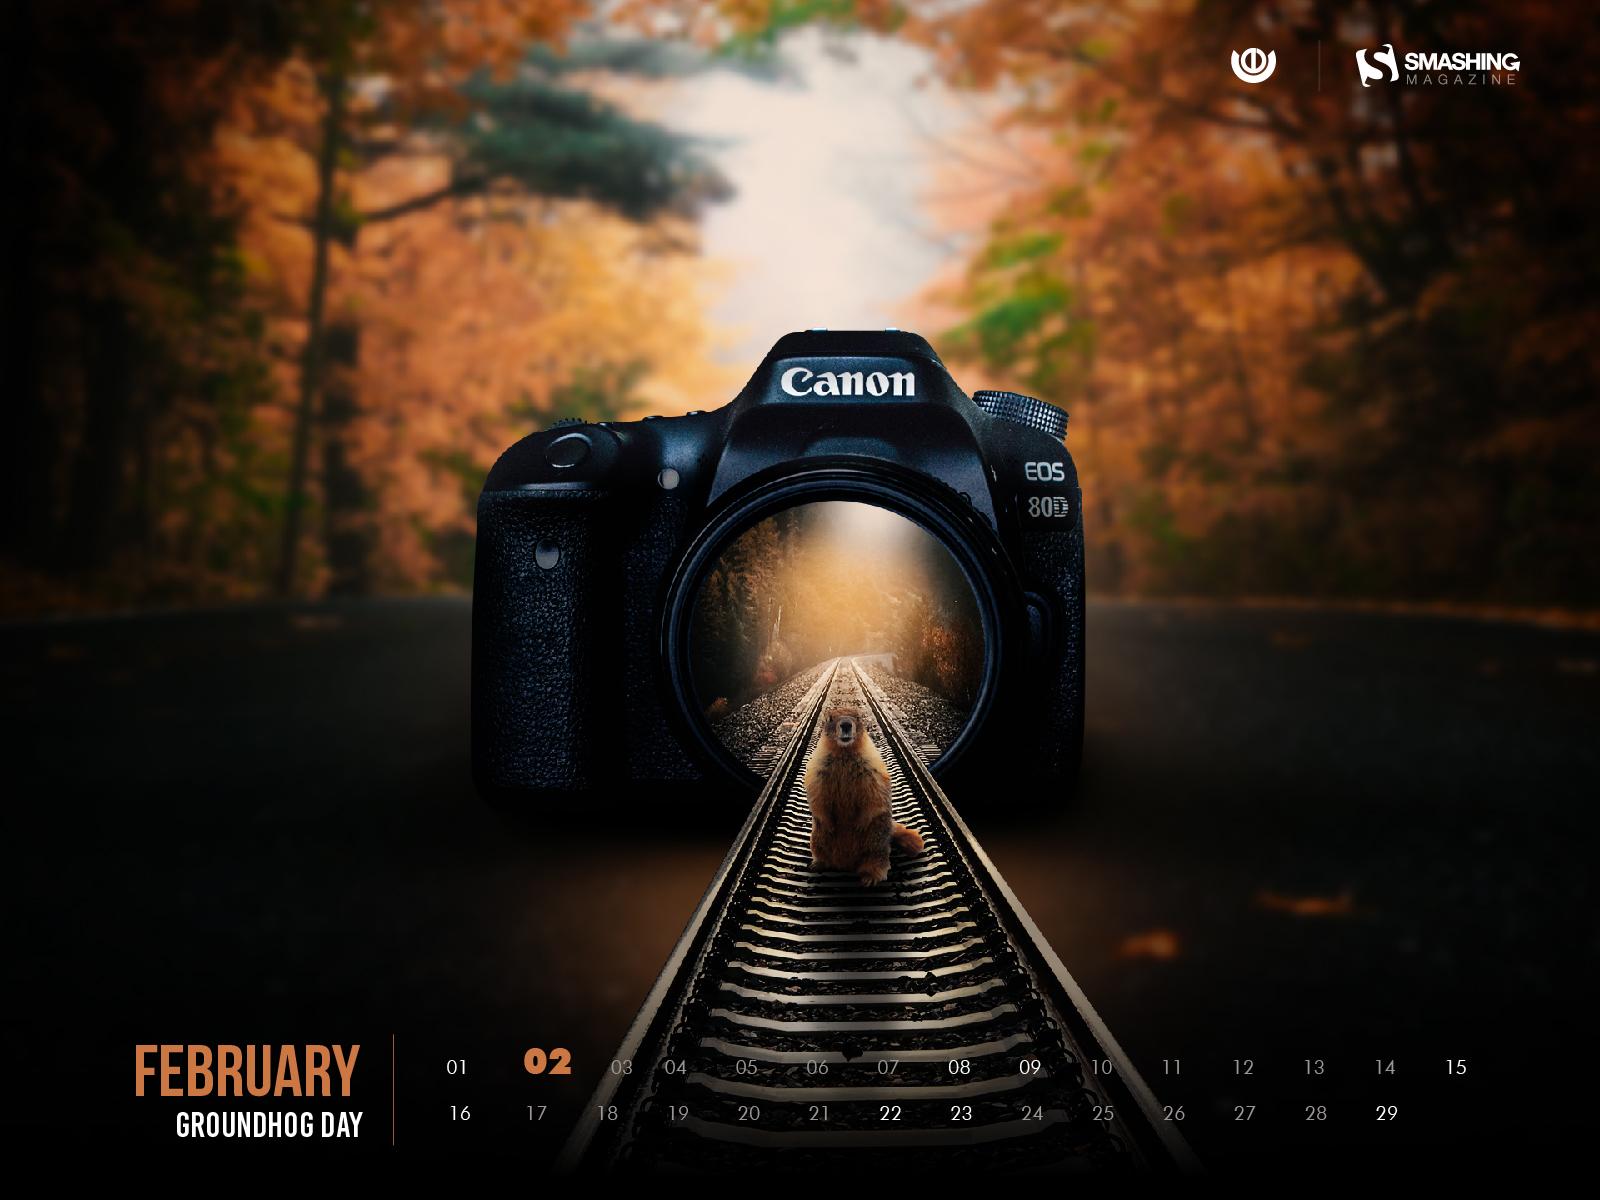 29 Days Of February 2020 Wallpapers Edition Smashing Magazine 1600x1200